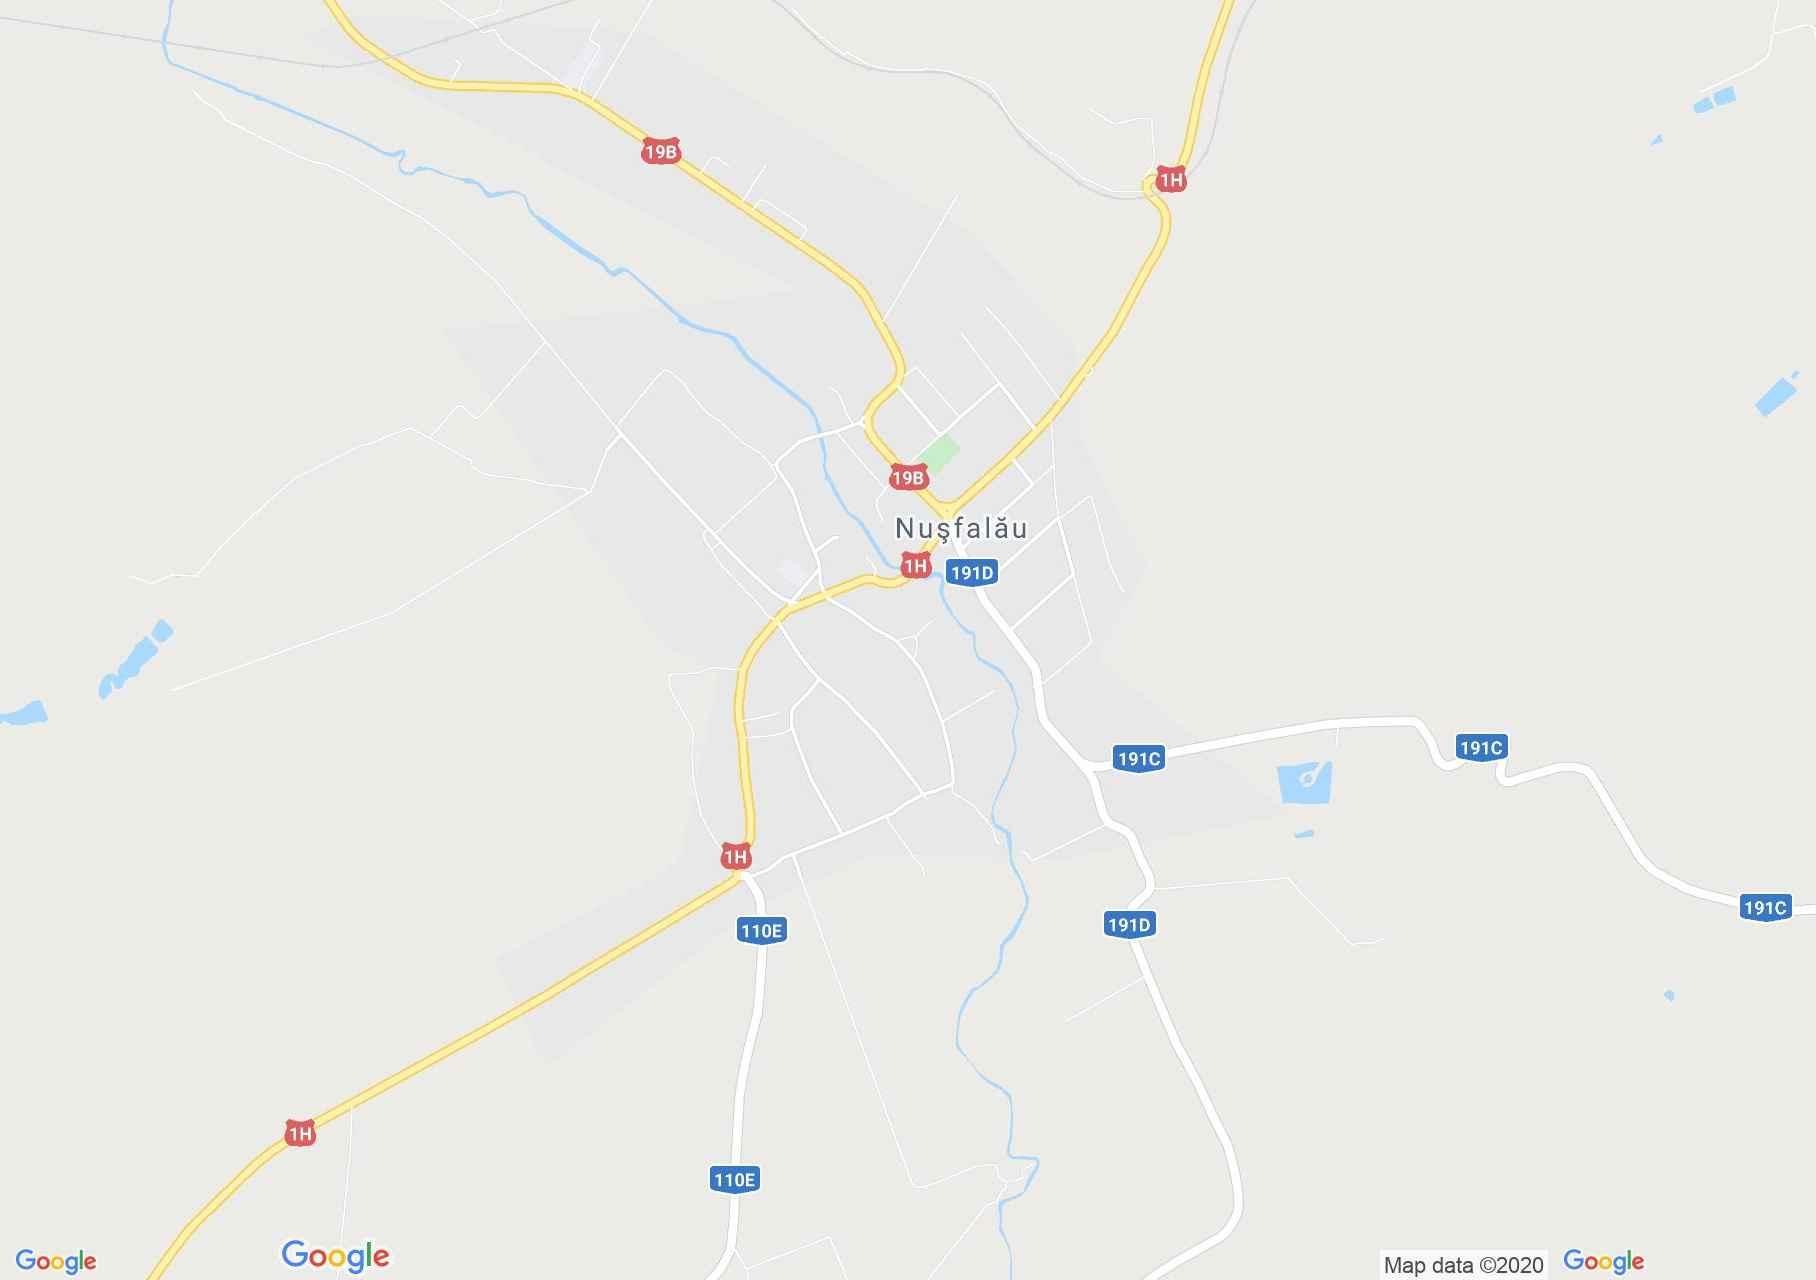 Nuşfalău, Interactive tourist map